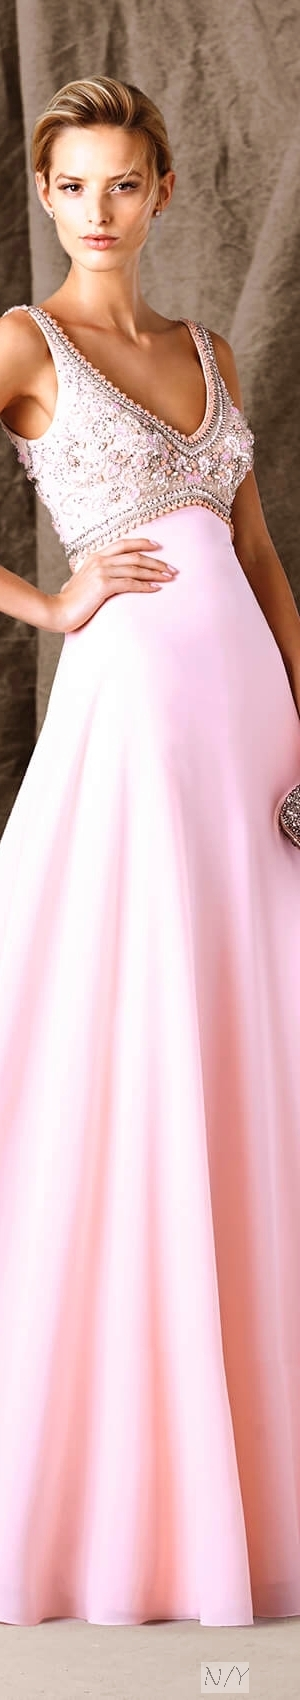 Pronovias 2017 Cocktail Dresses/Cleo | Pronovias | Pinterest ...